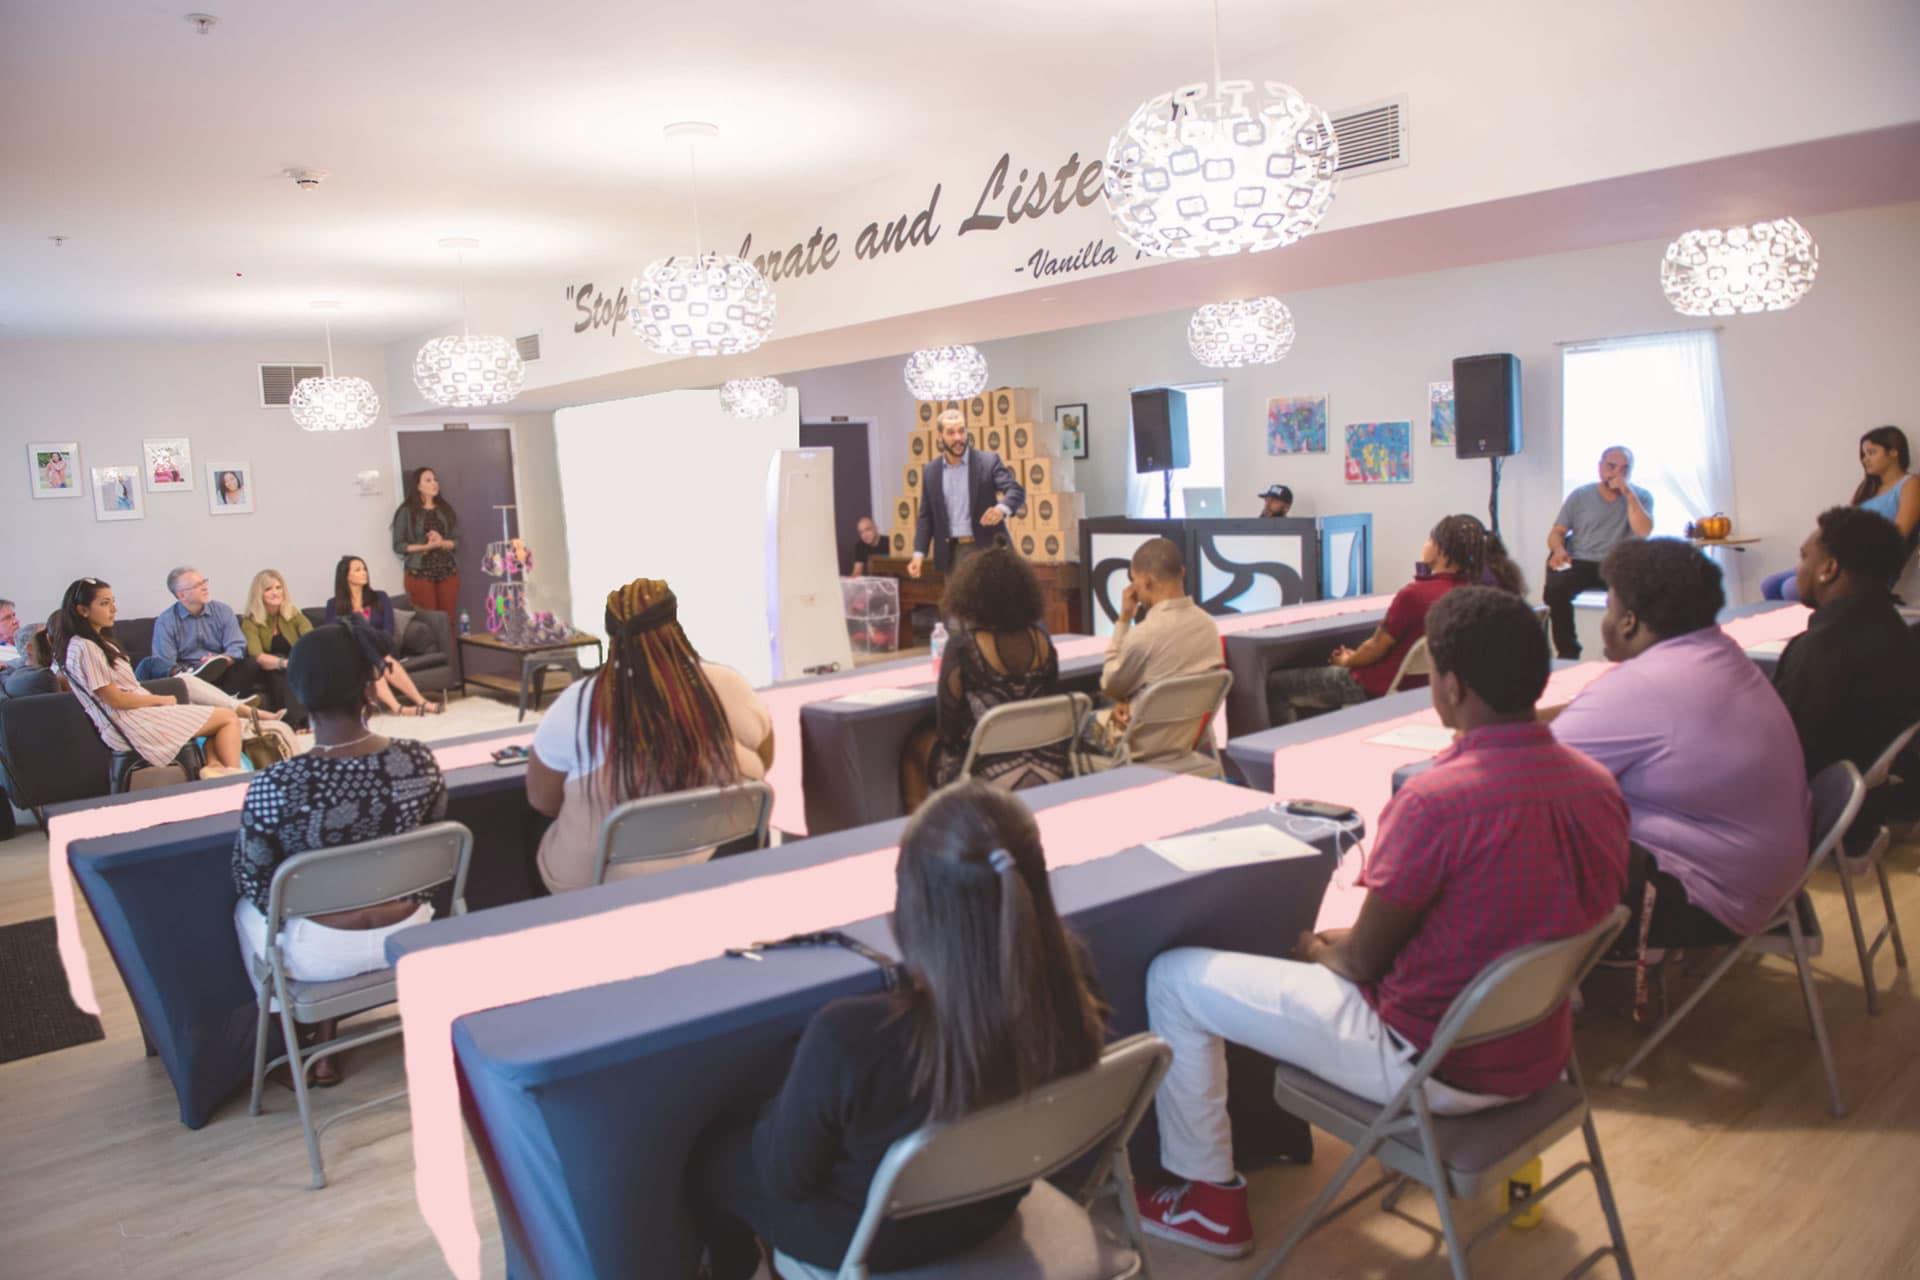 Dale Carnegie's Leadership Training | Selfless Love Foundation